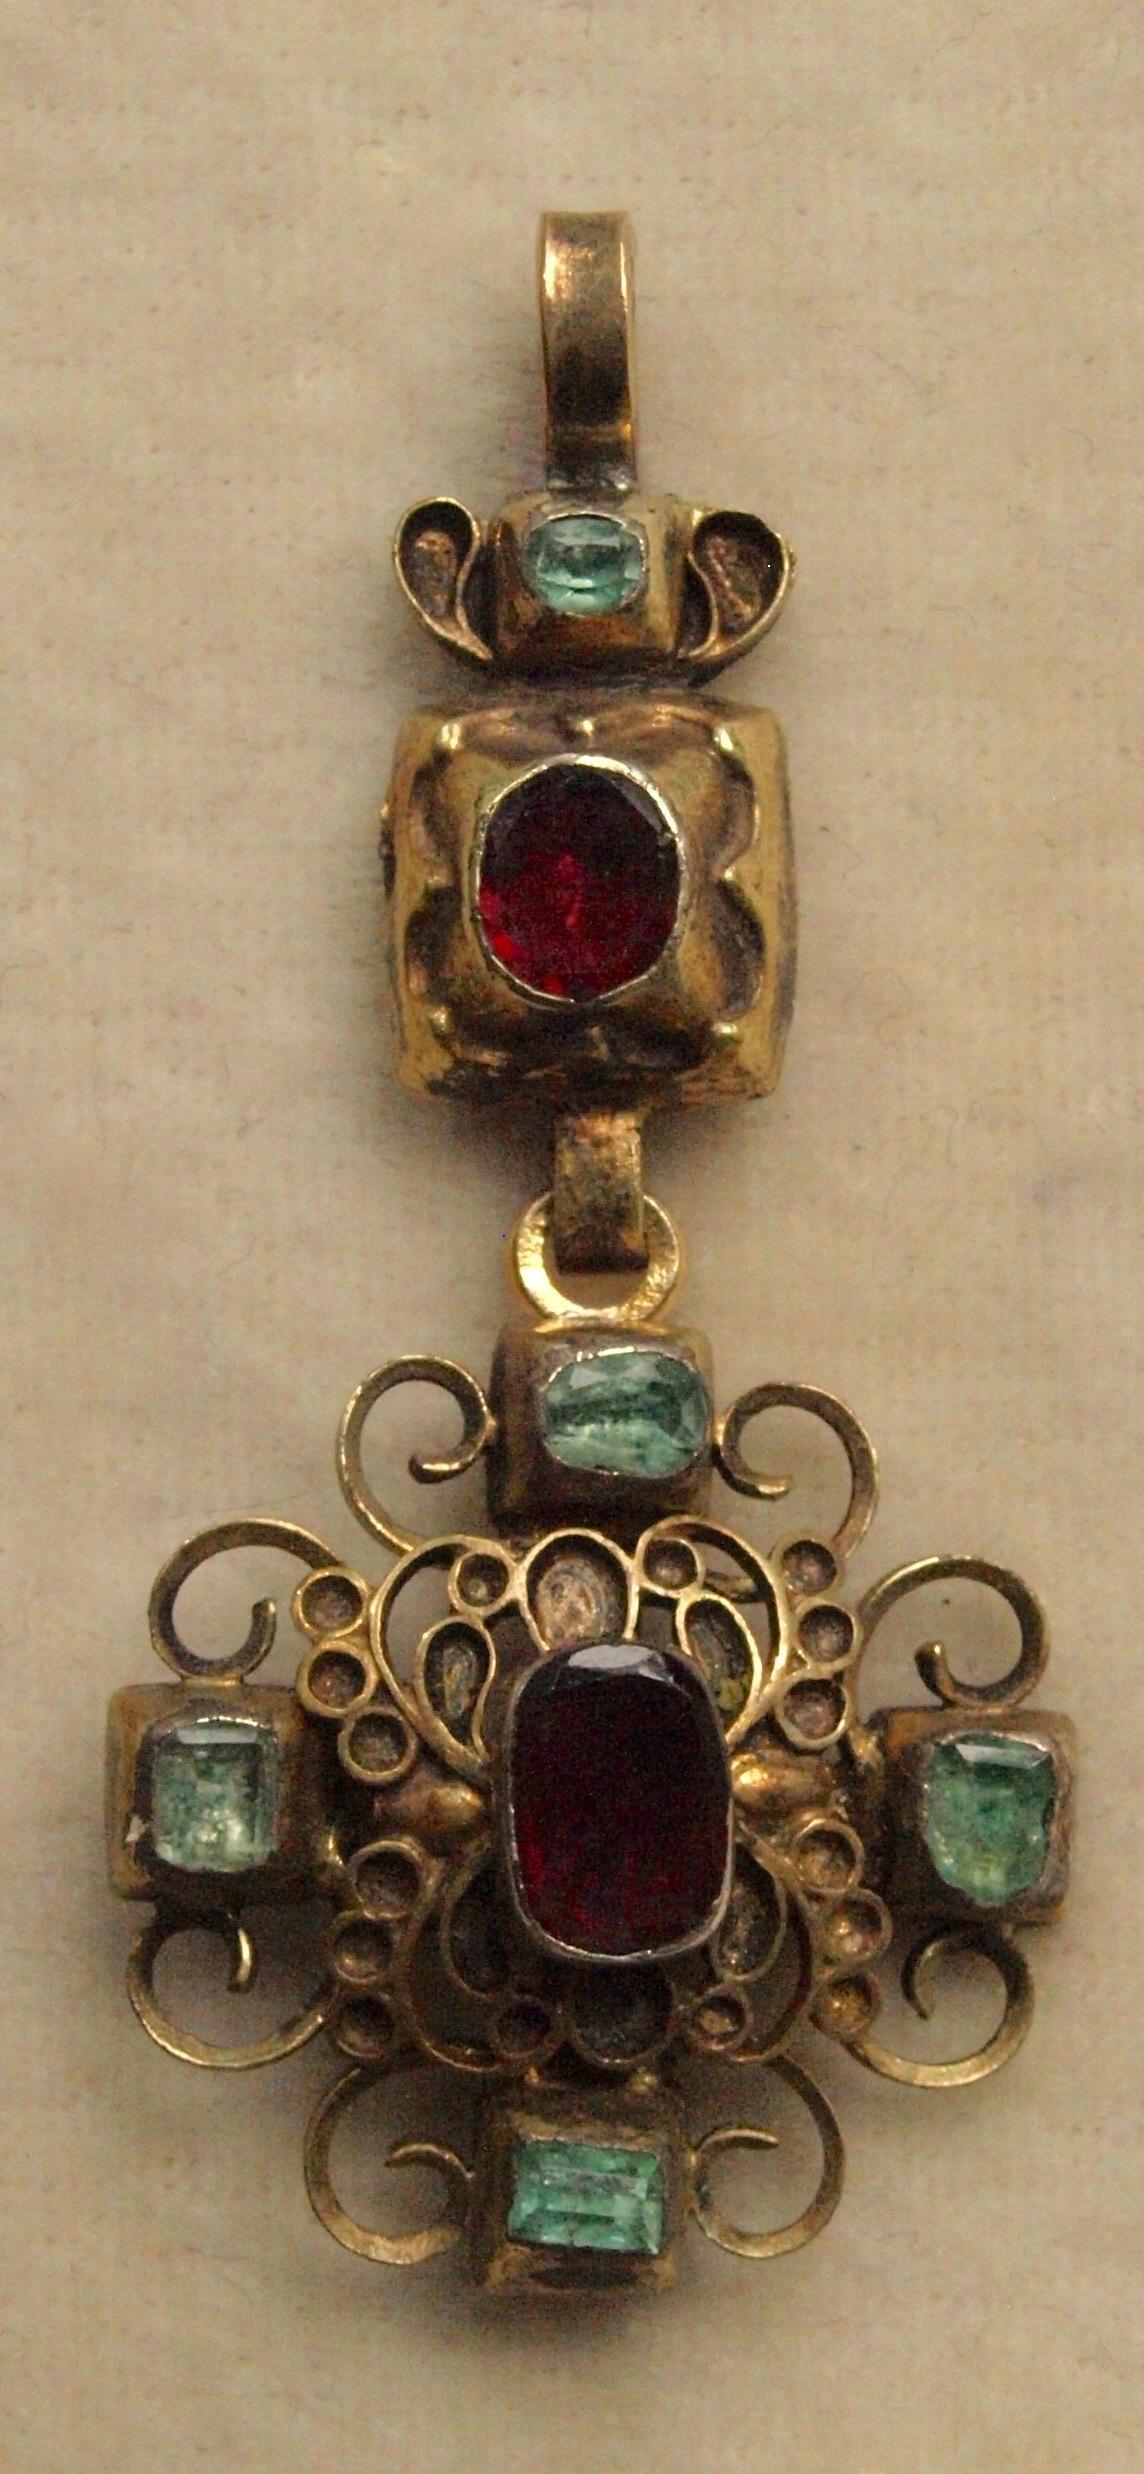 18th Century Cruciform Pendant Garnets and Emeralds